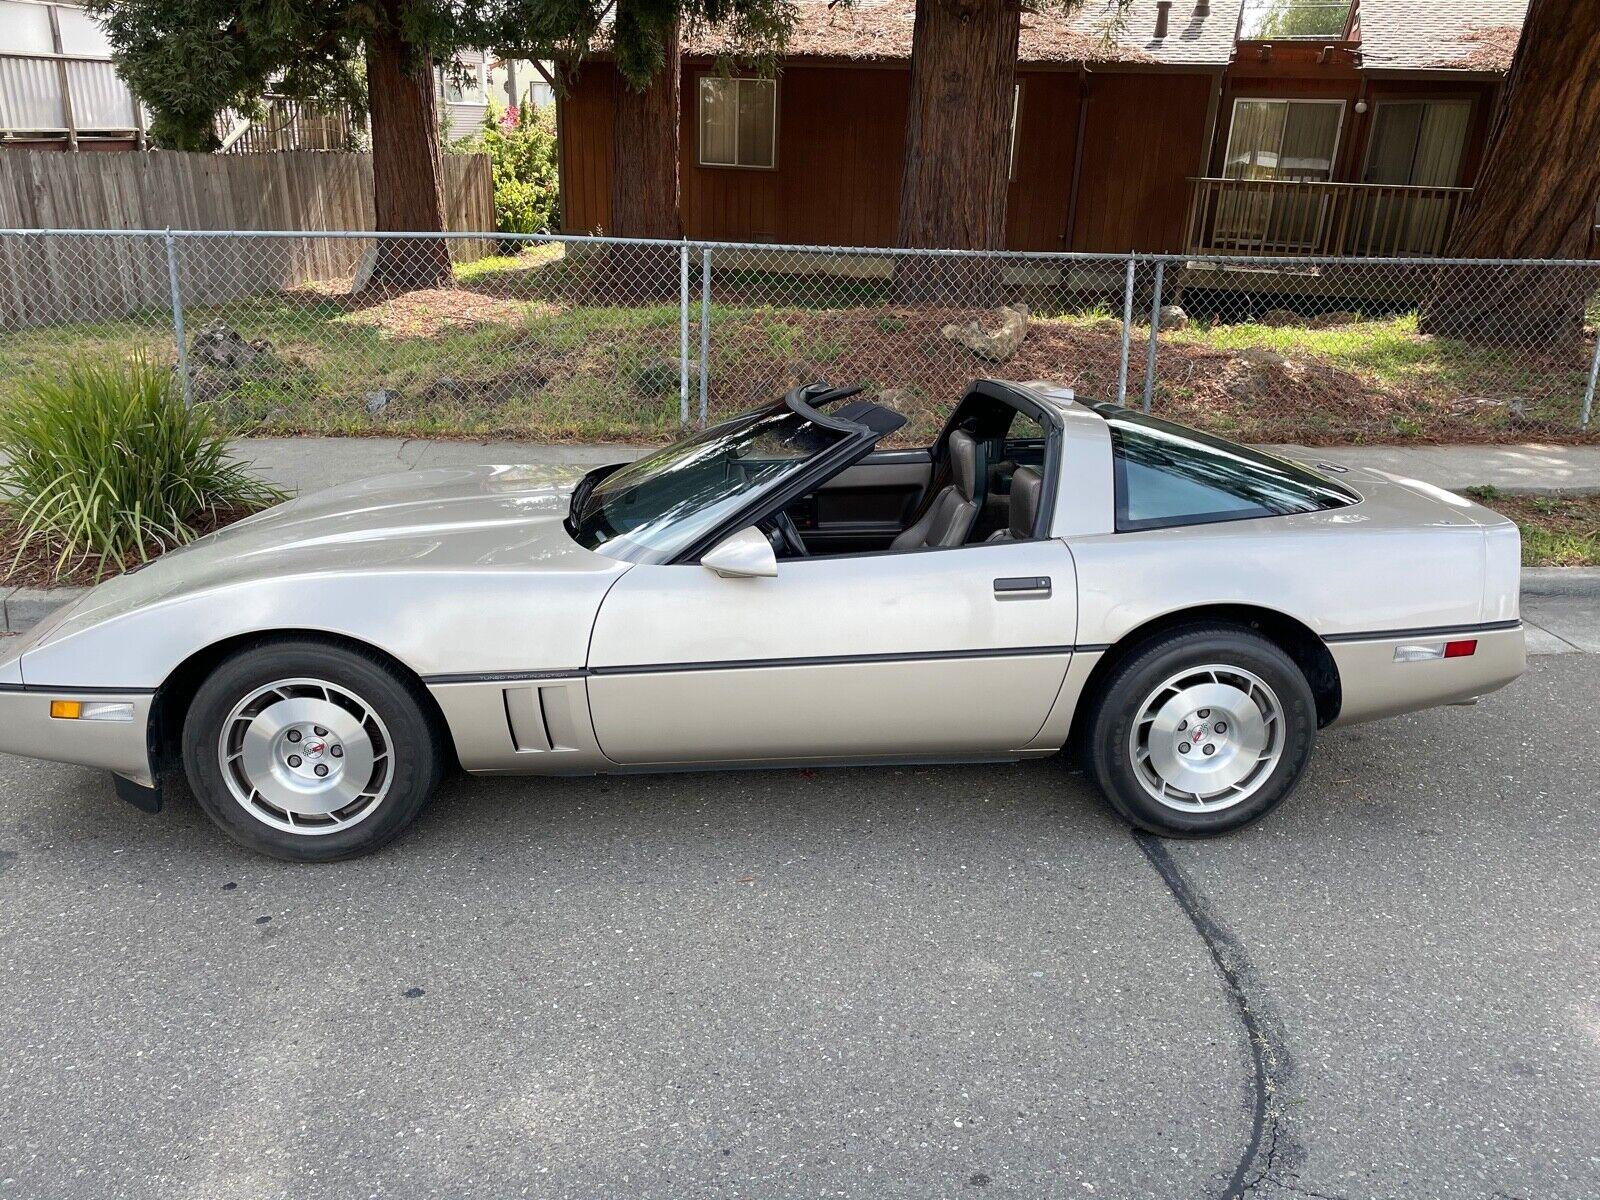 1986 Gold Chevrolet Corvette     C4 Corvette Photo 1